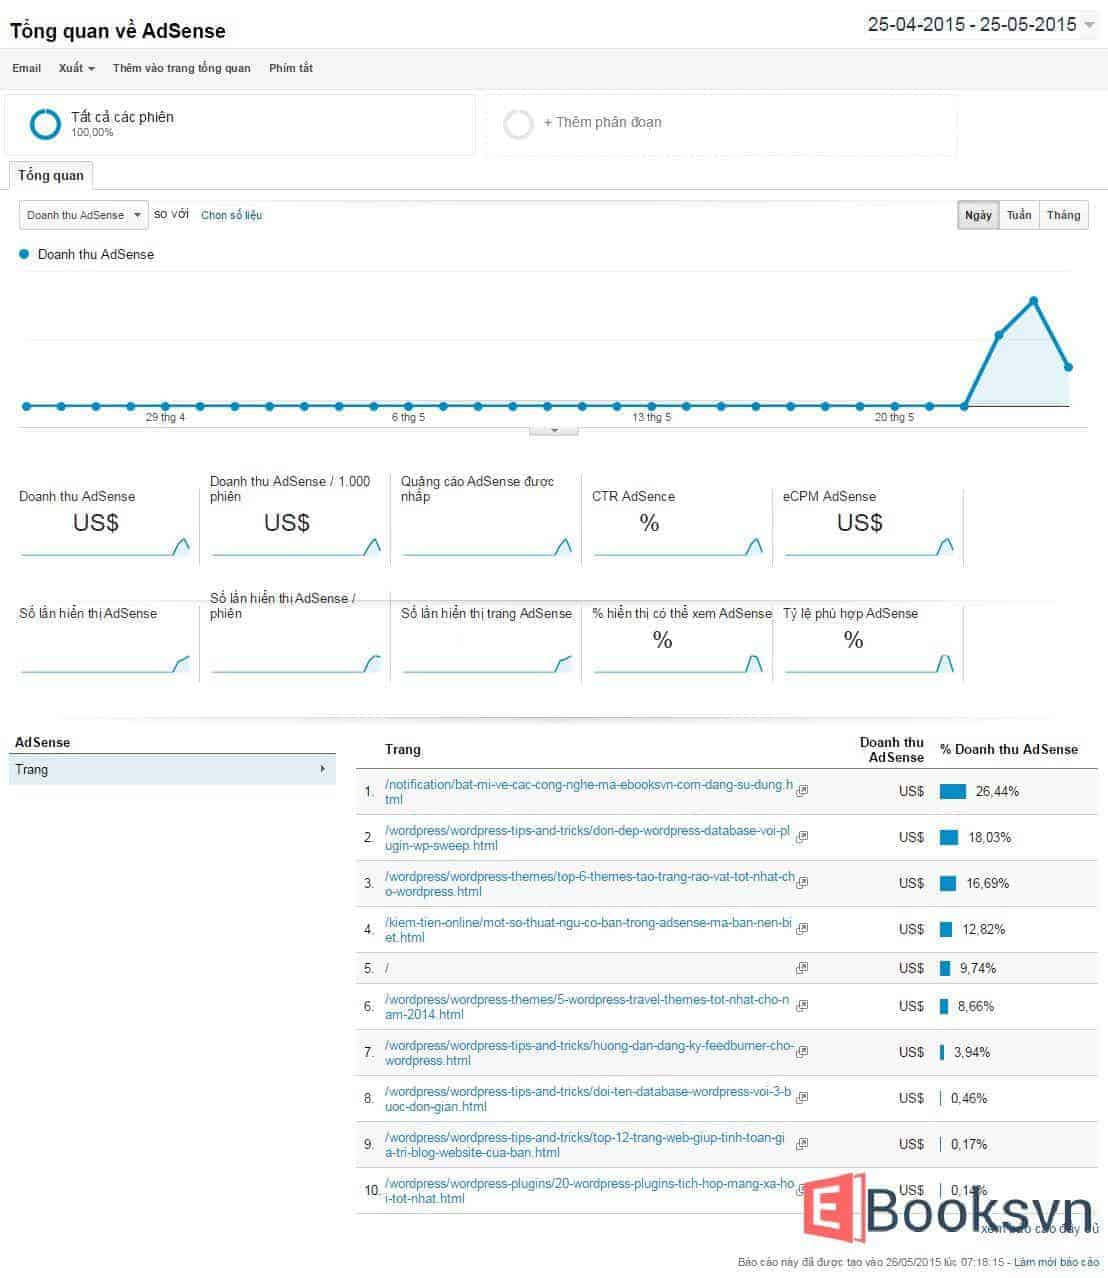 thong-ke-thu-nhap-adsense-tren-google-analytics